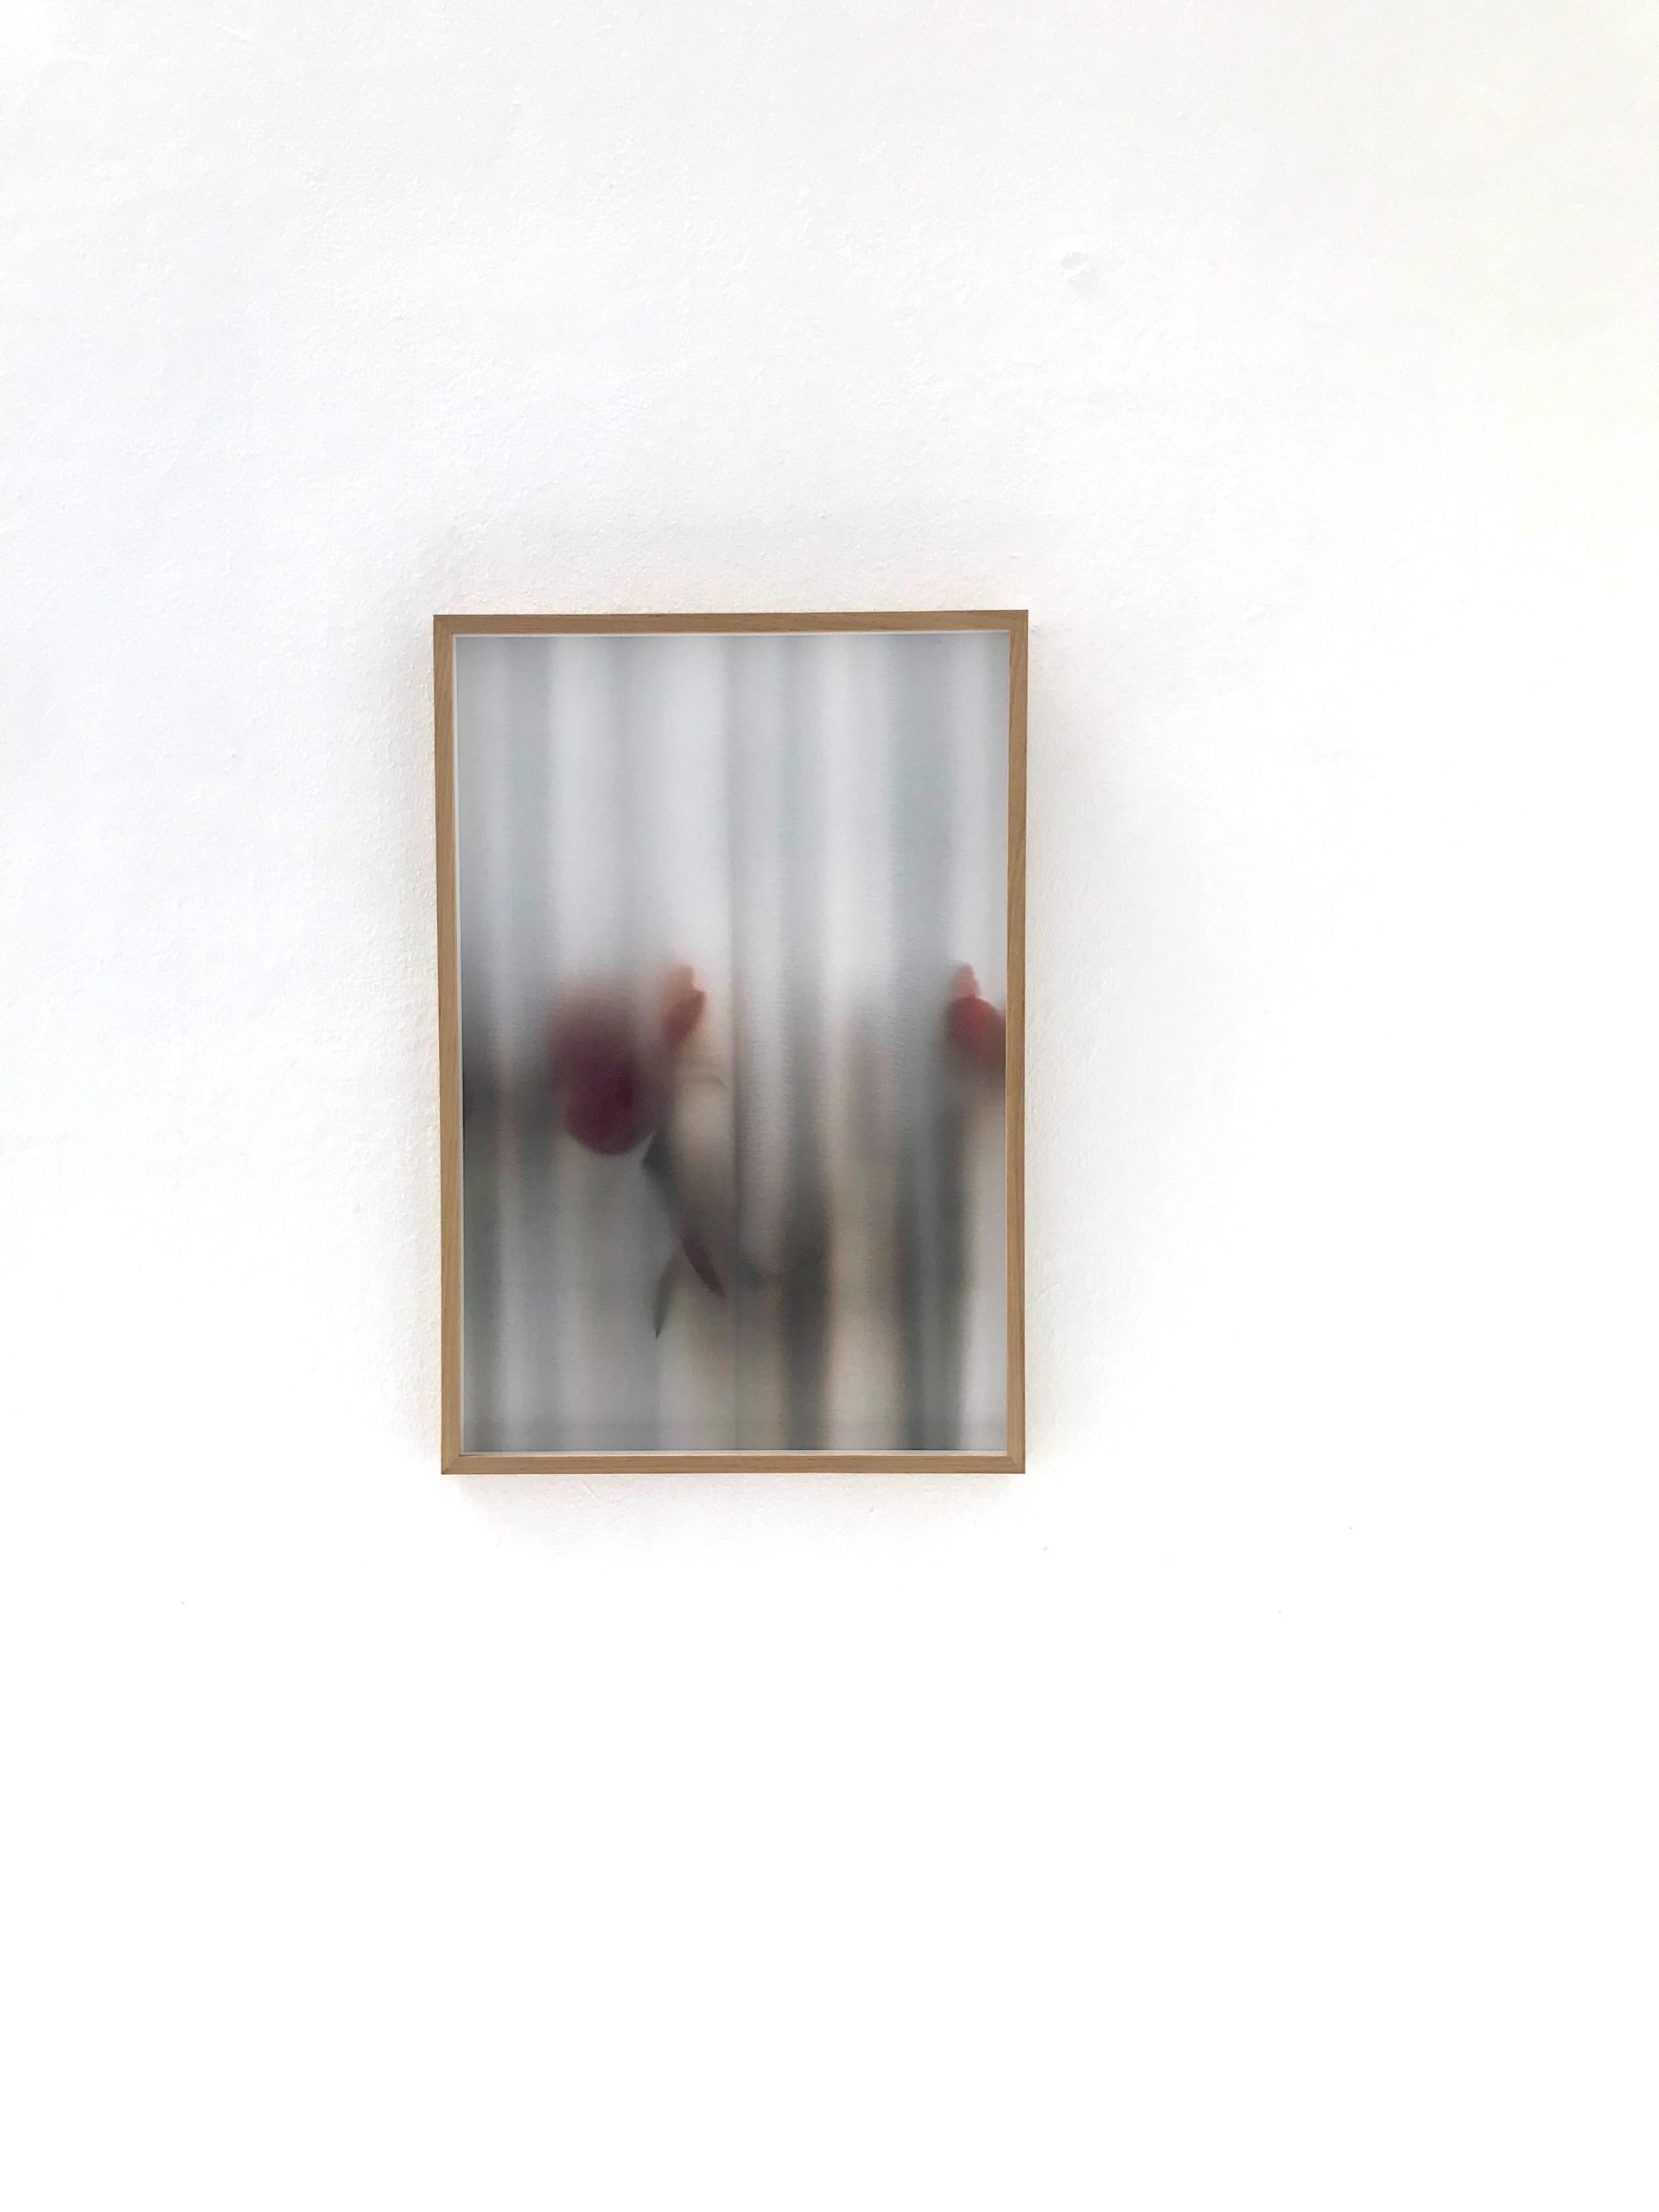 Ande och Materia / Mind and Matter, april 2020. Kristina Eldon (photography)